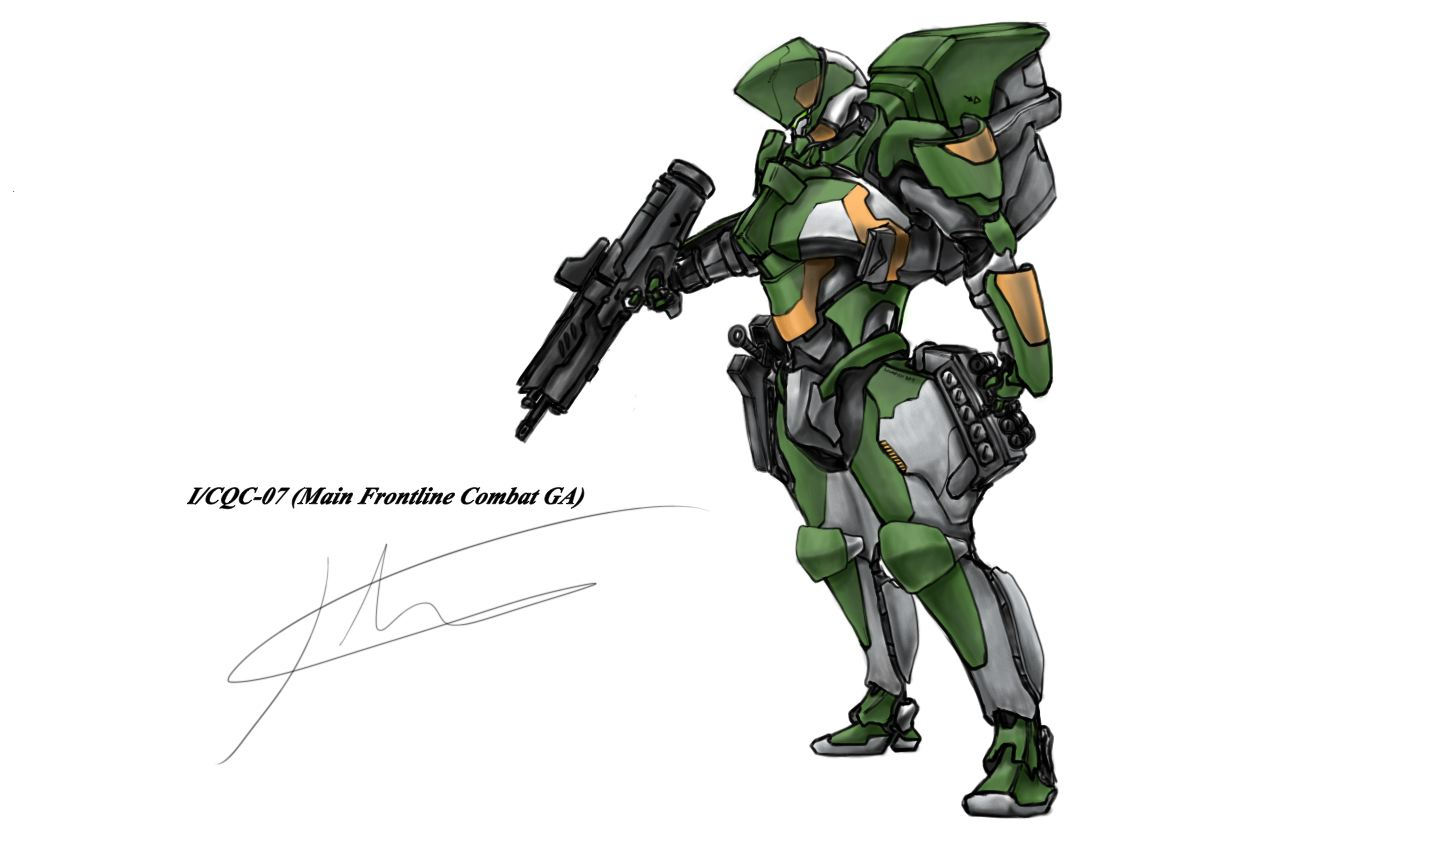 I/CQC-07 Green by hhello